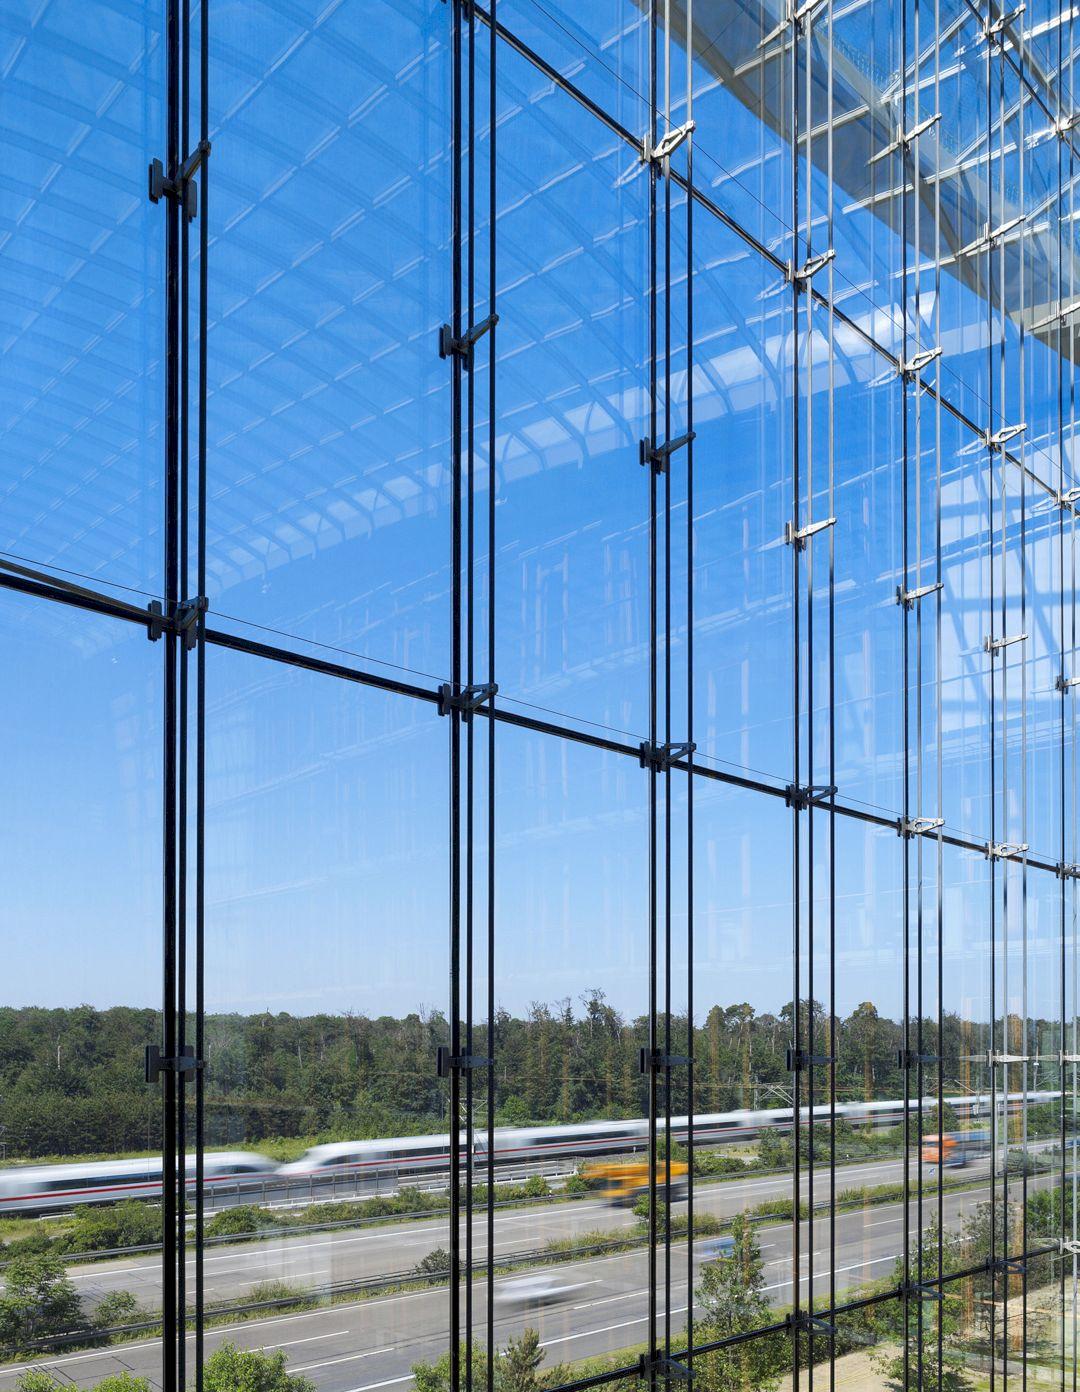 Lufthansa Aviation Center Frankfurt By Ingenhoven Architects 11